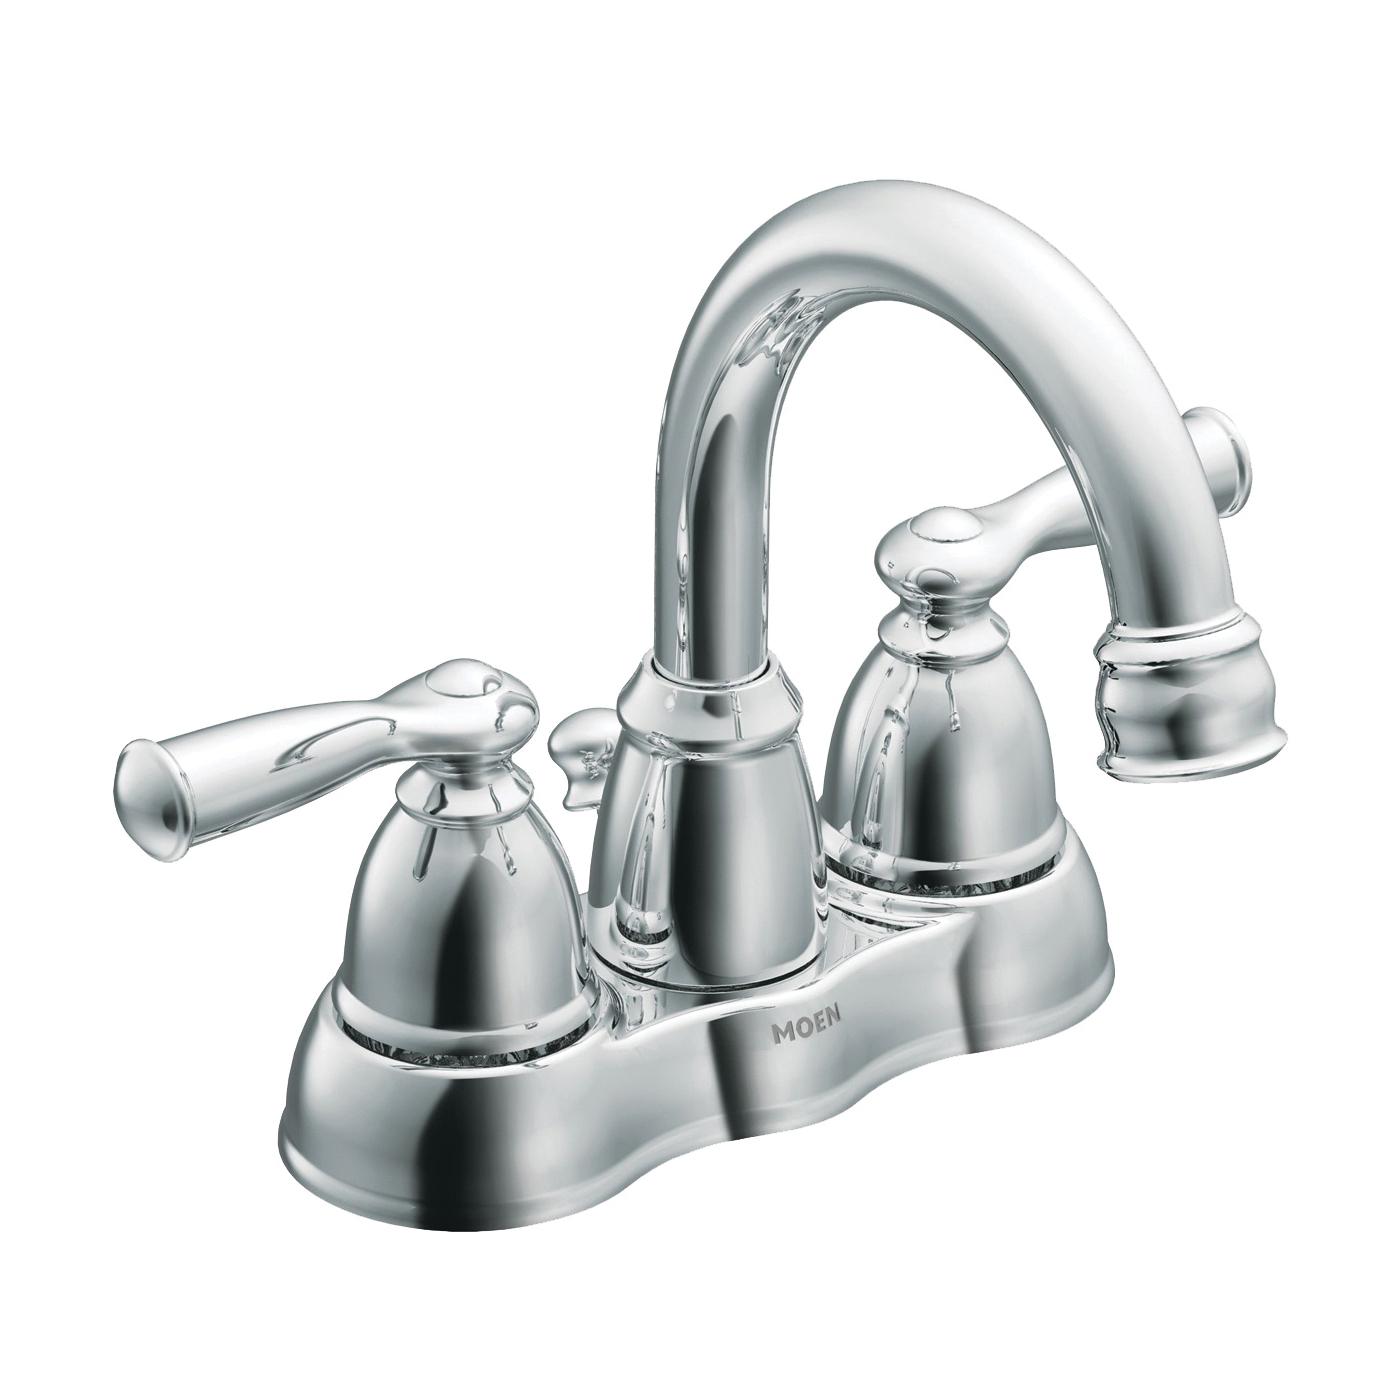 Picture of Moen Banbury WS84913SRN Bathroom Faucet, 1.2 gpm, 2-Faucet Handle, Metal, Brushed Nickel, Lever Handle